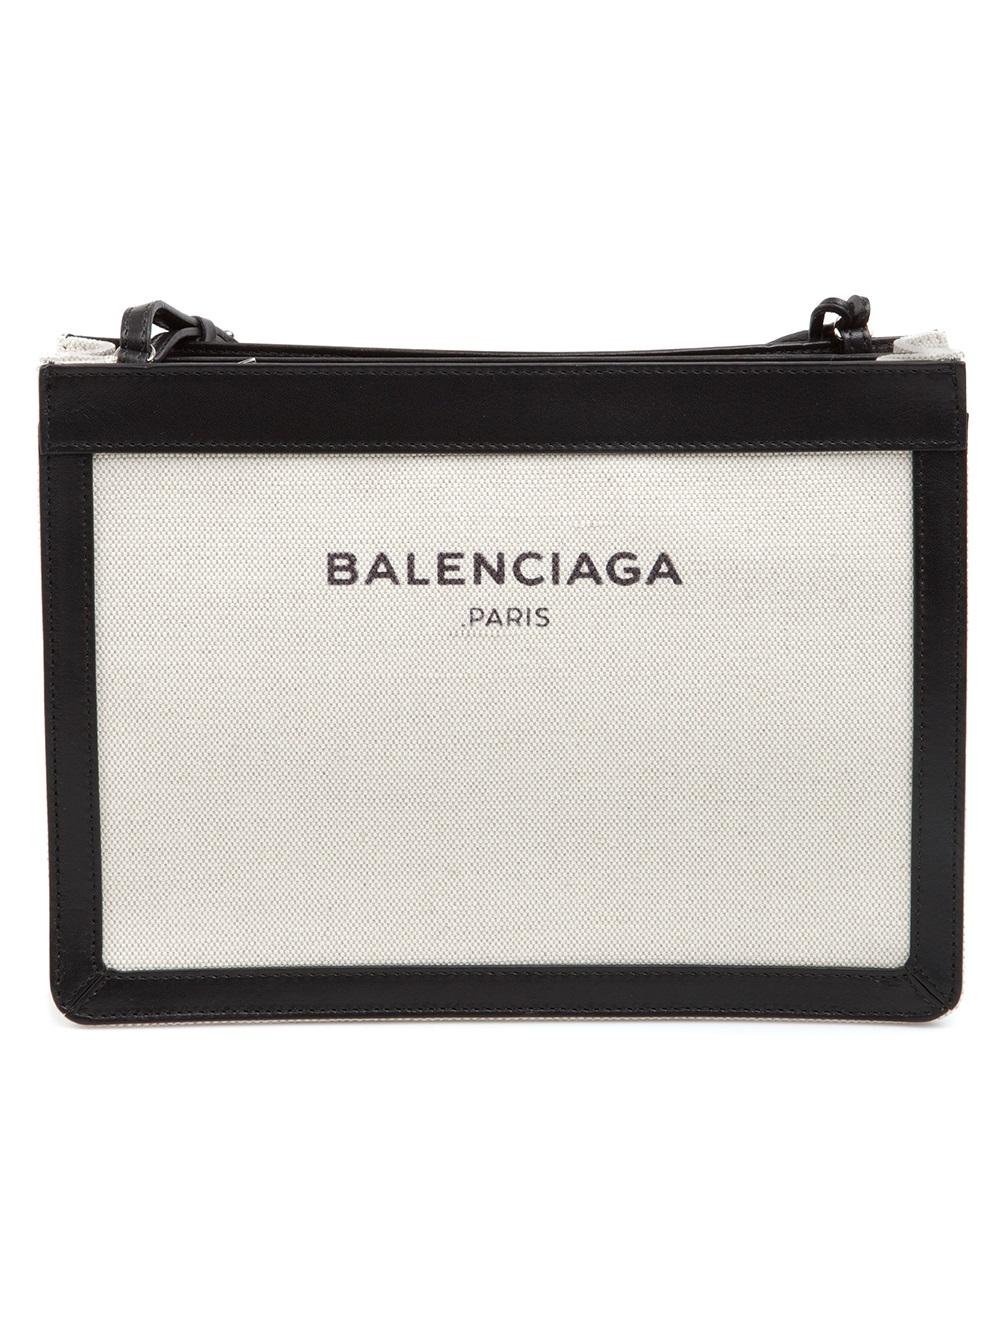 Balenciaga Logo Print Shoulder Bag In Black Lyst